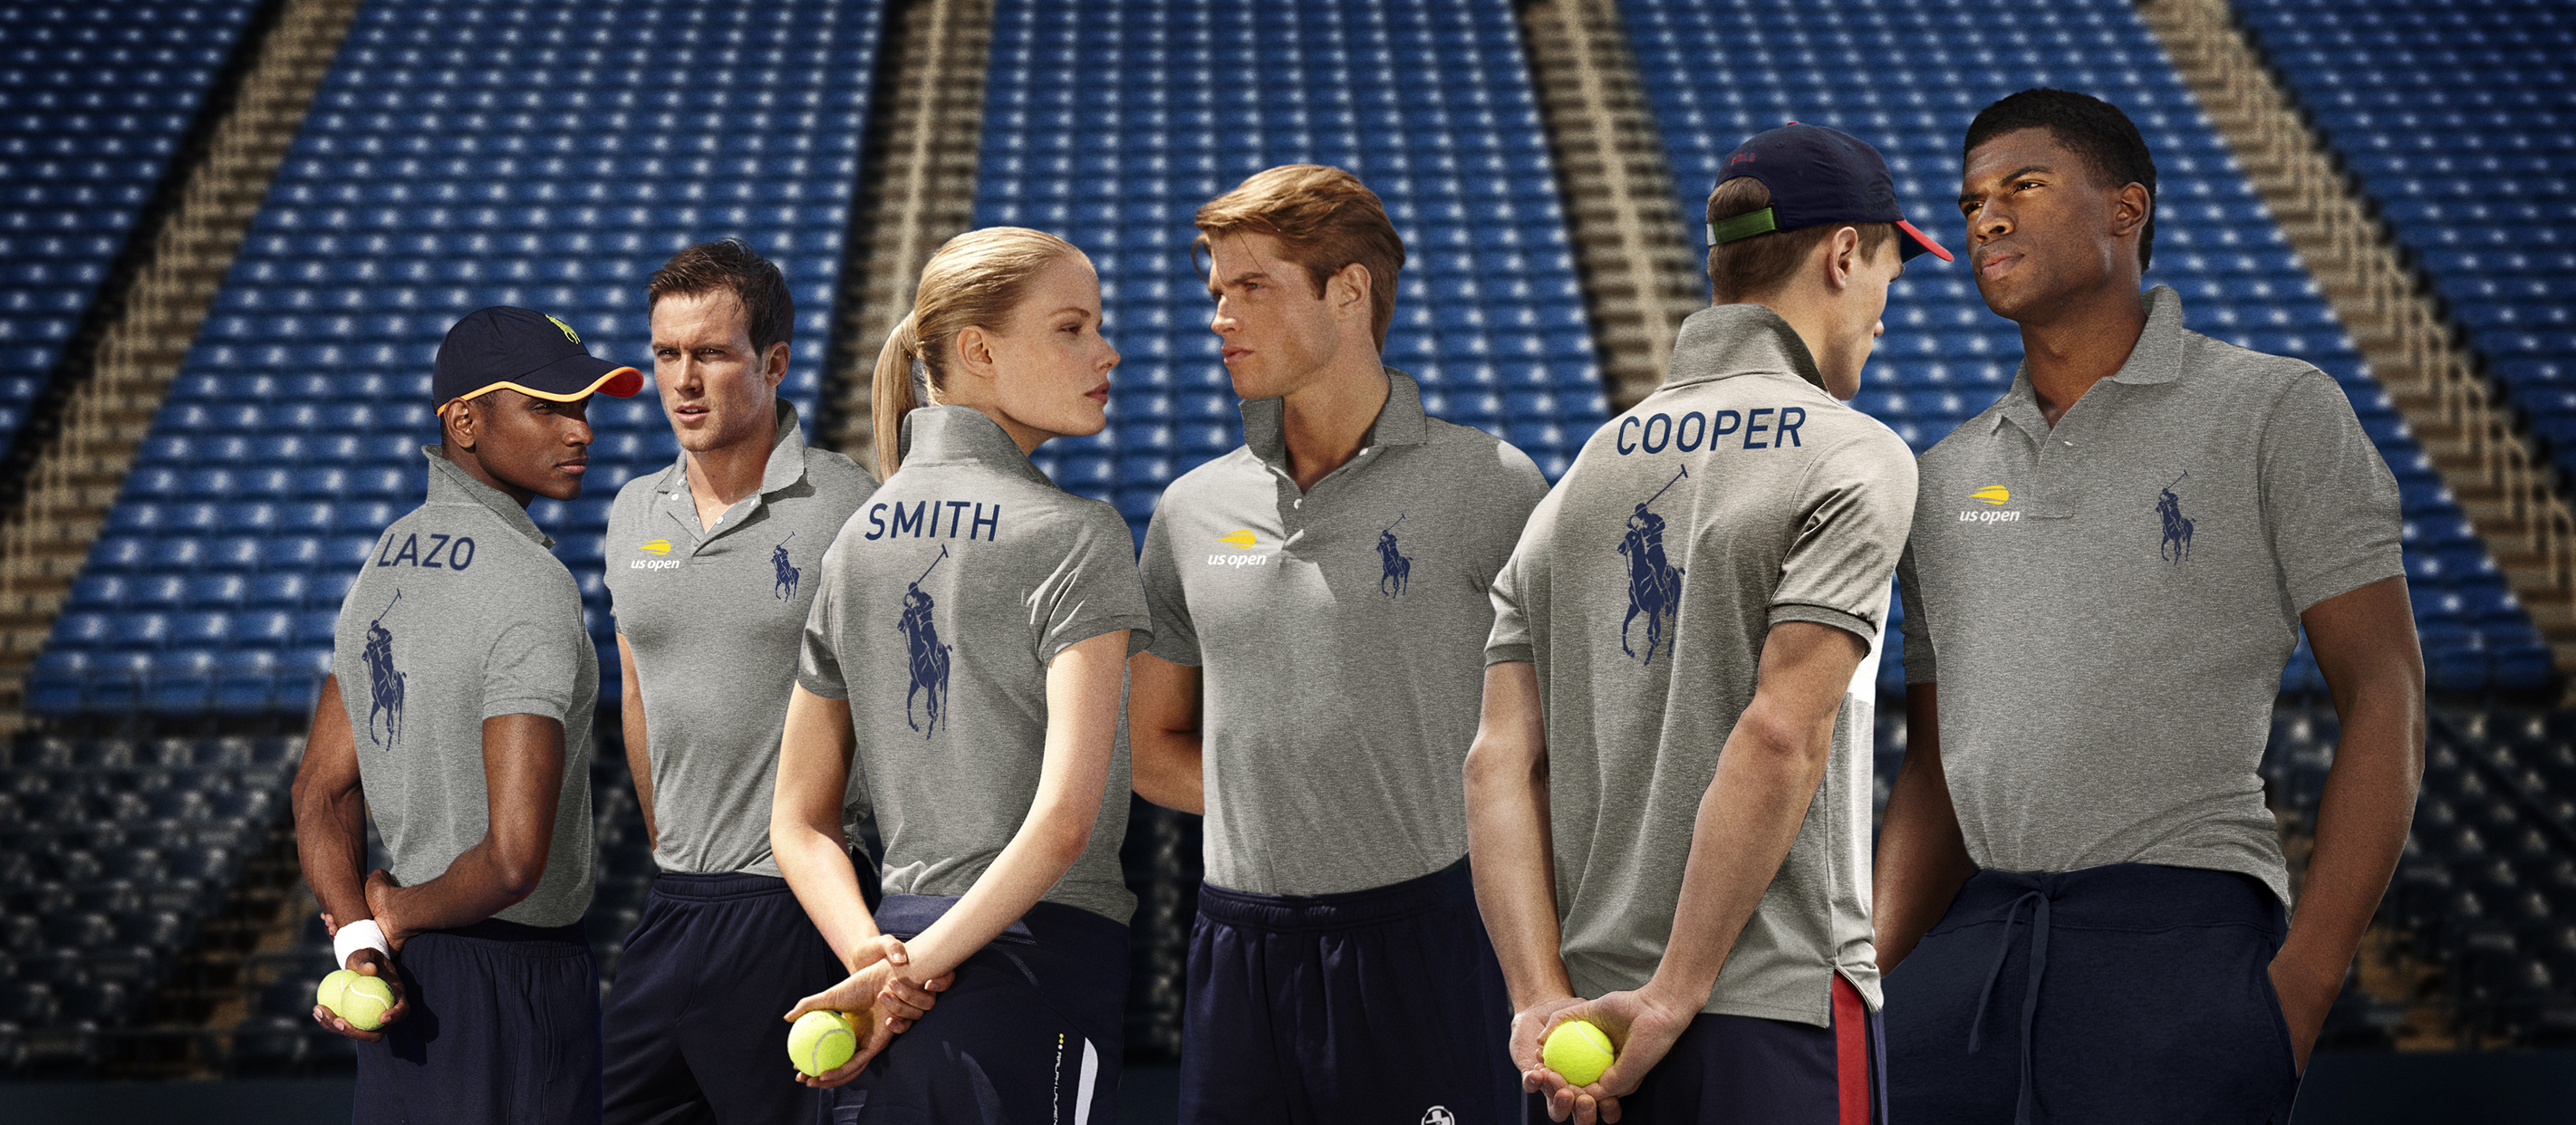 Polo Ralph Lauren ballpeople shirts for U.S. Open